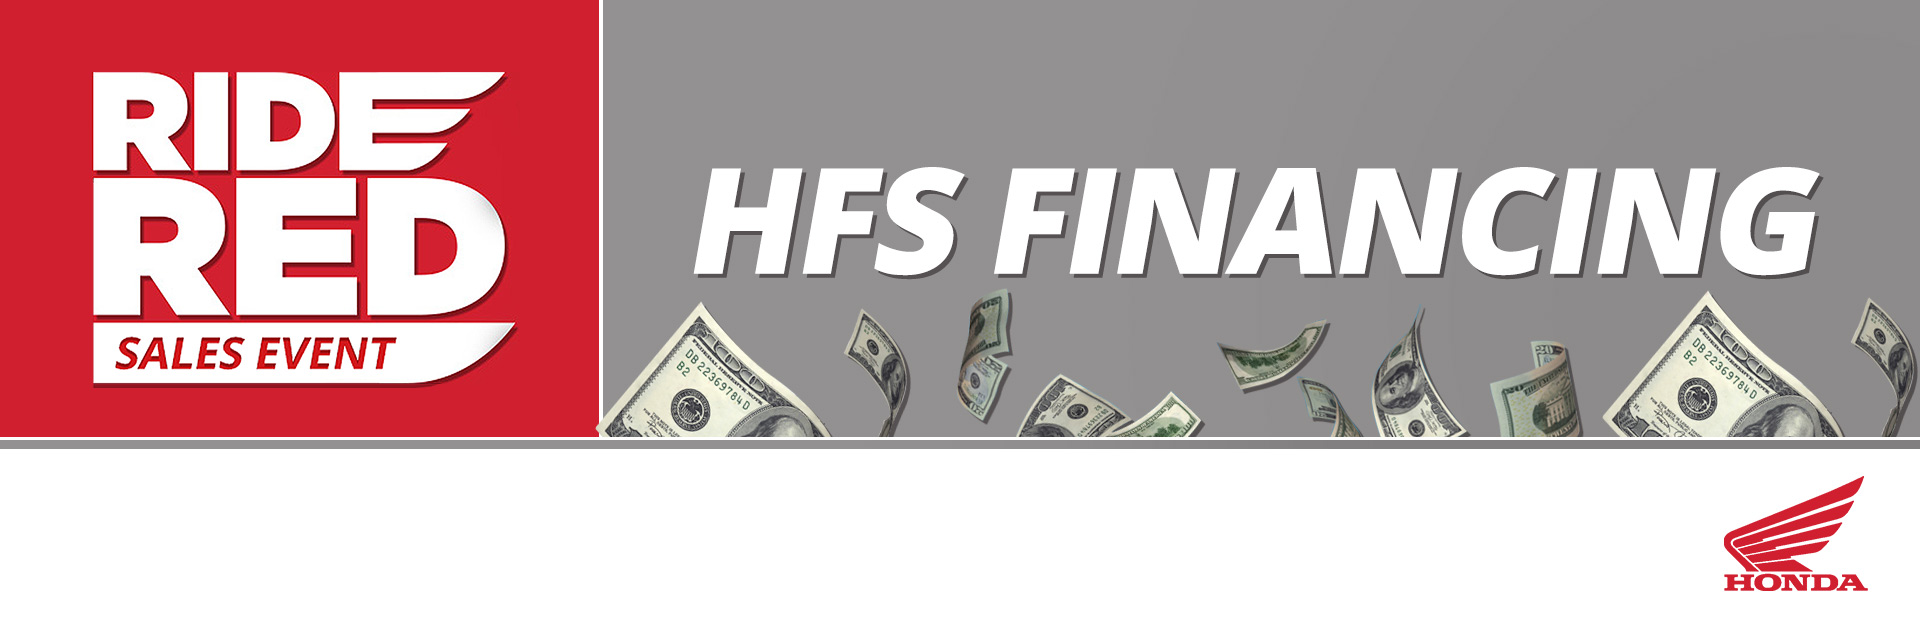 Home northwest honda rice lake wi 715 234 7557 for Honda finance corp